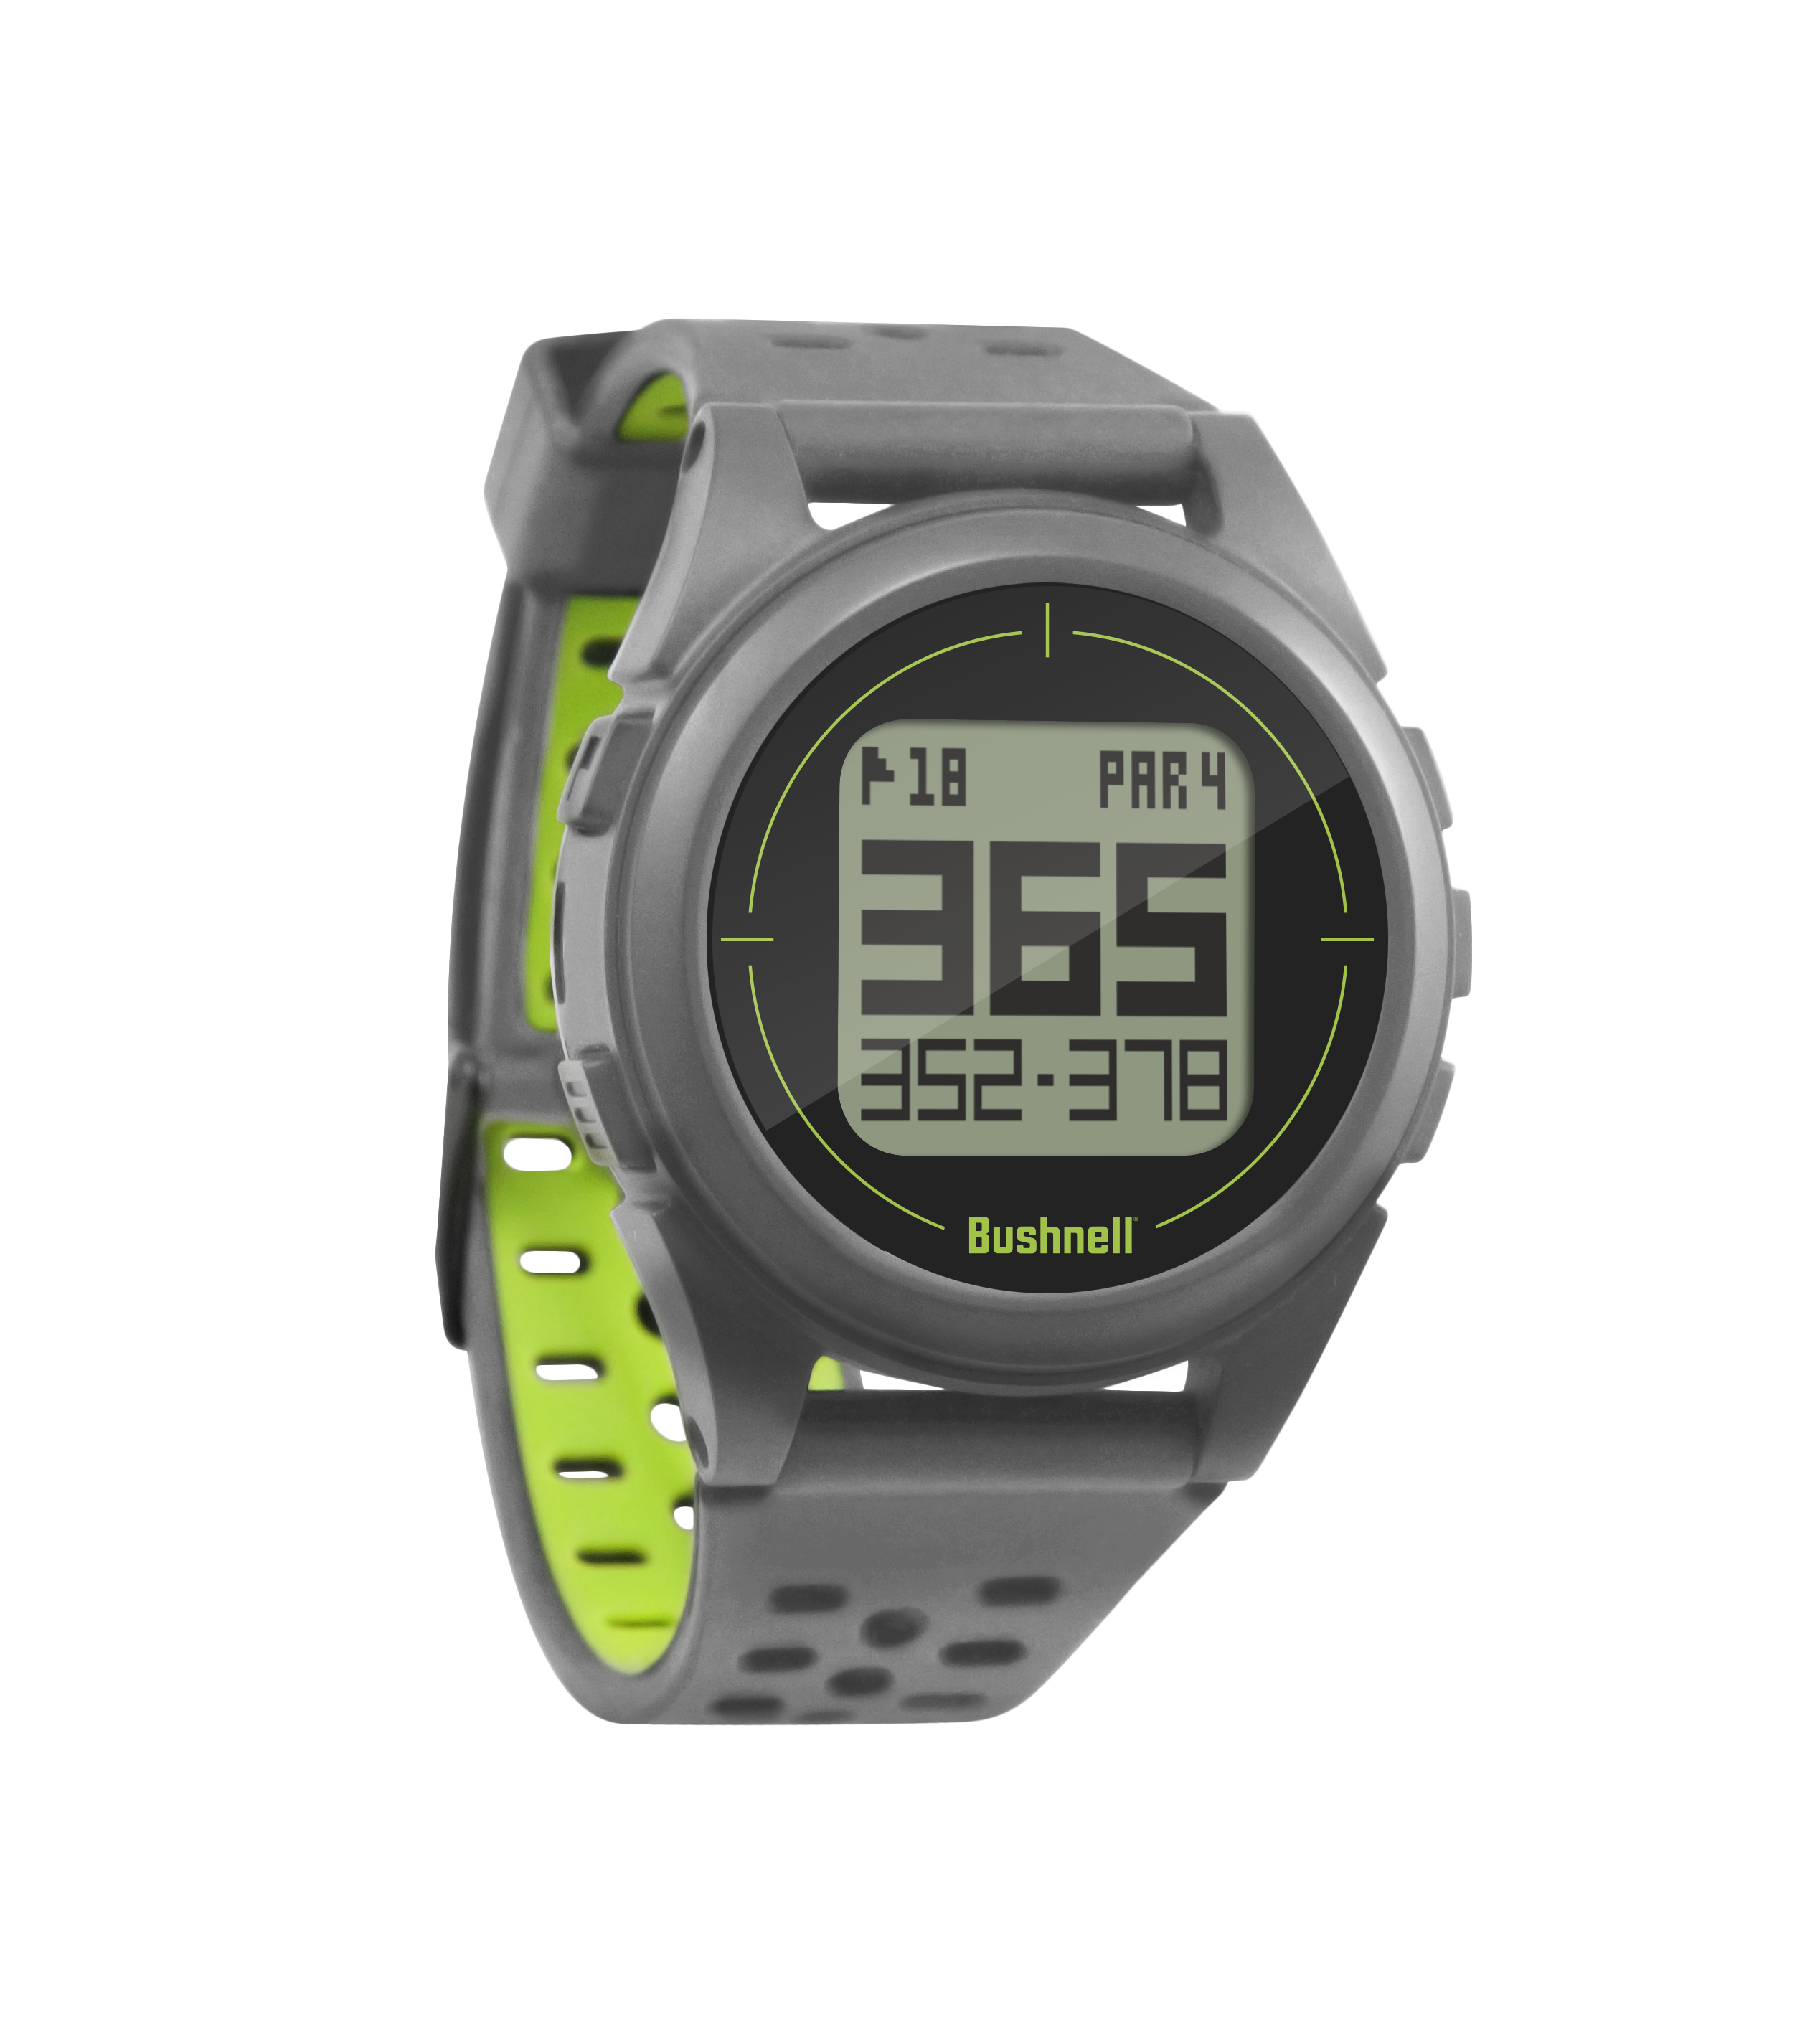 Bushnell iON2 GPS Golf Watch